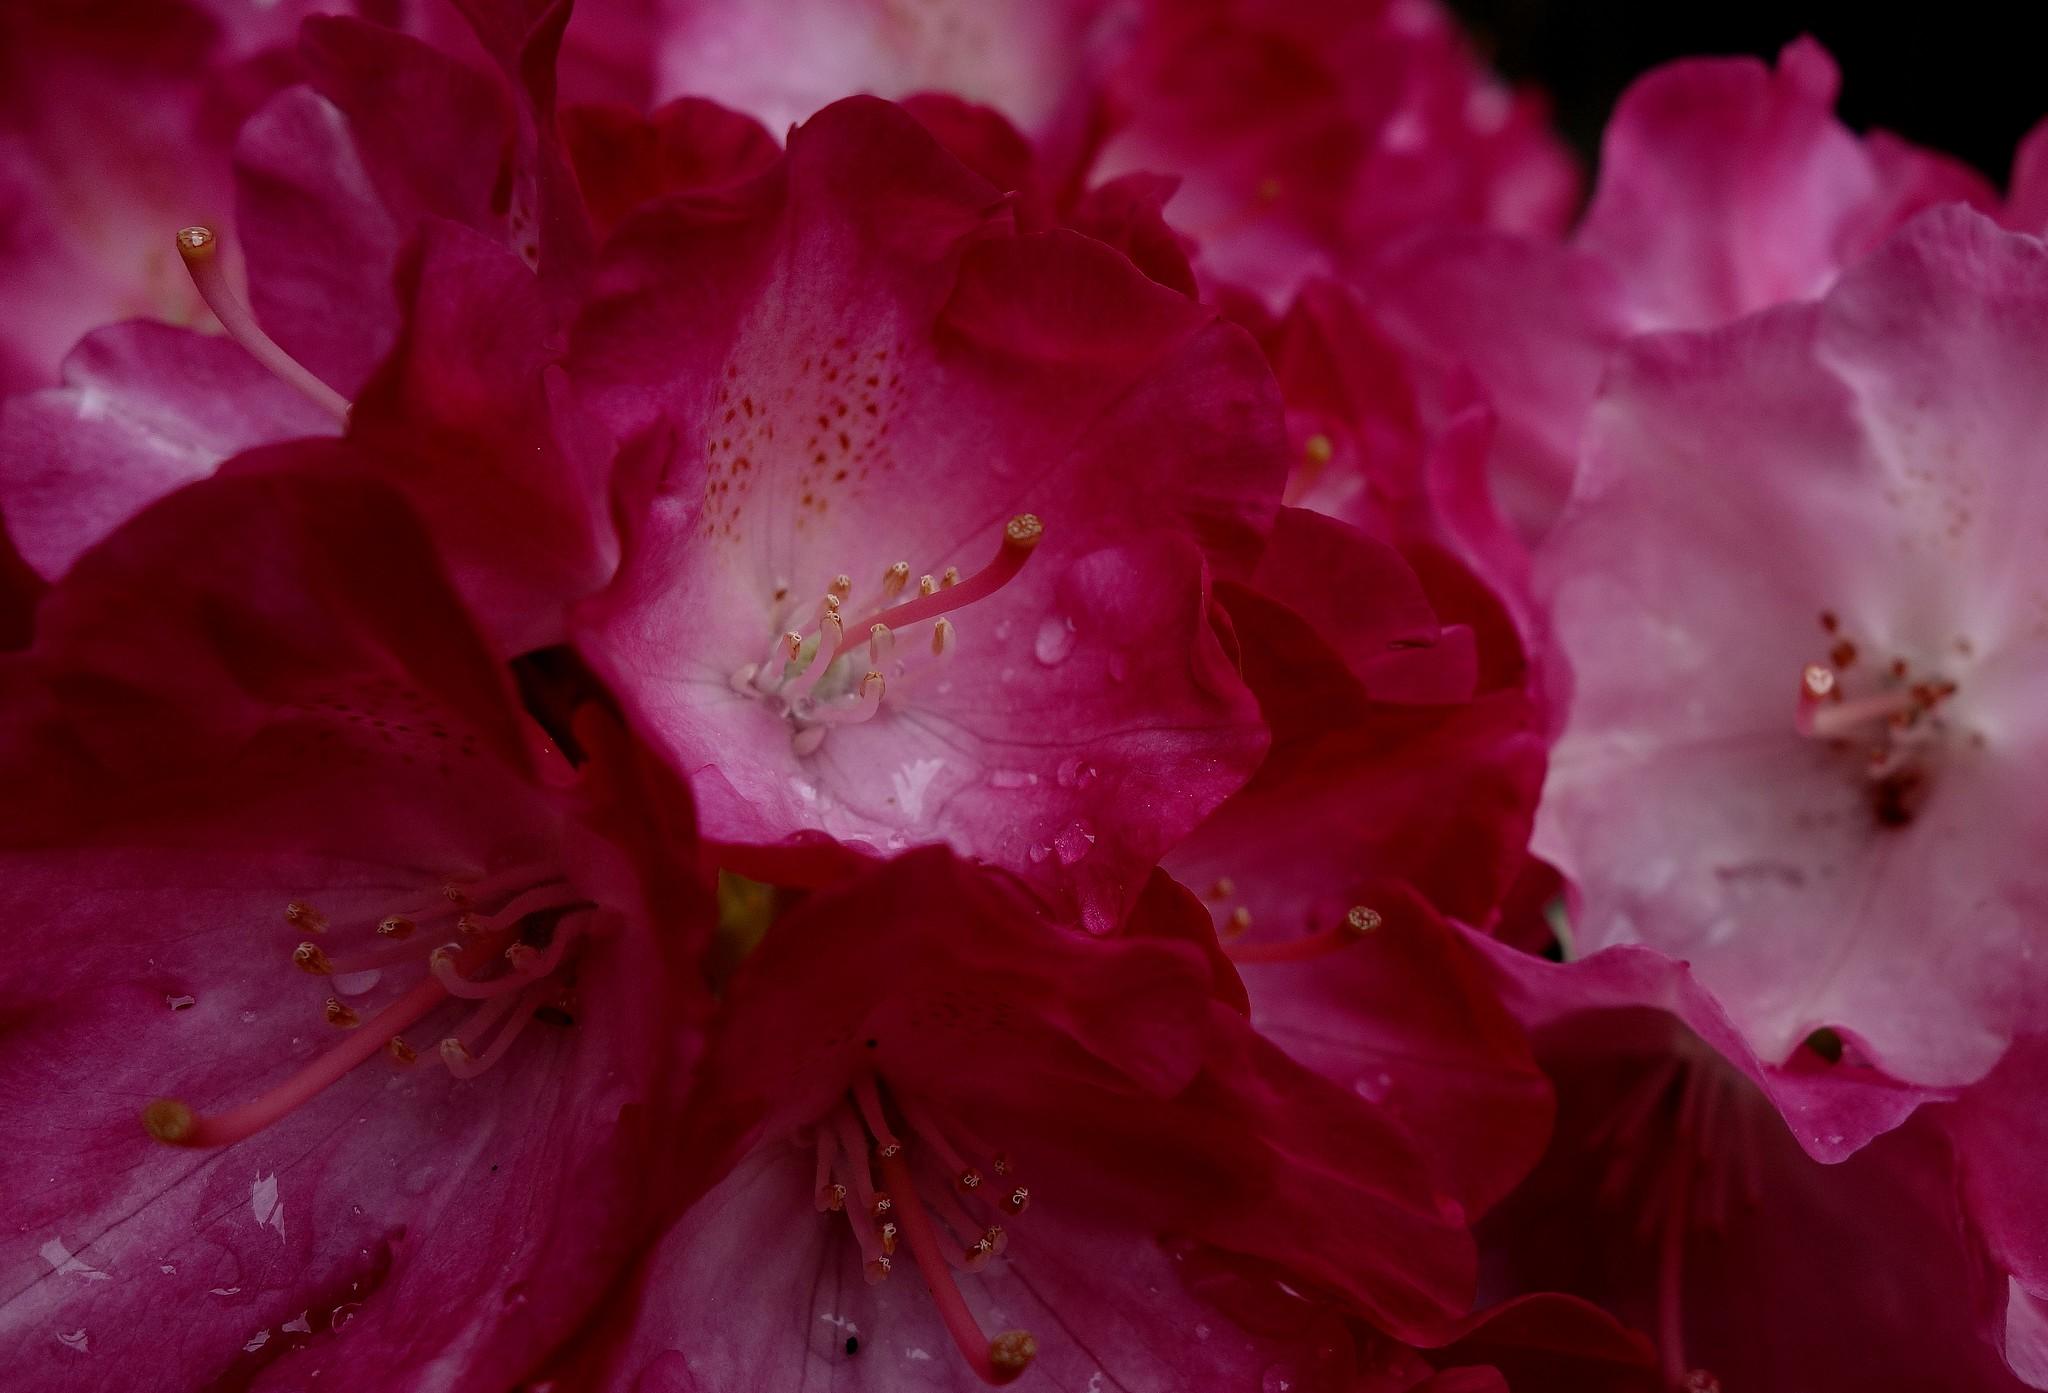 Blumen, Blüten, blossoms and flowers (serie) red, 76792/12084